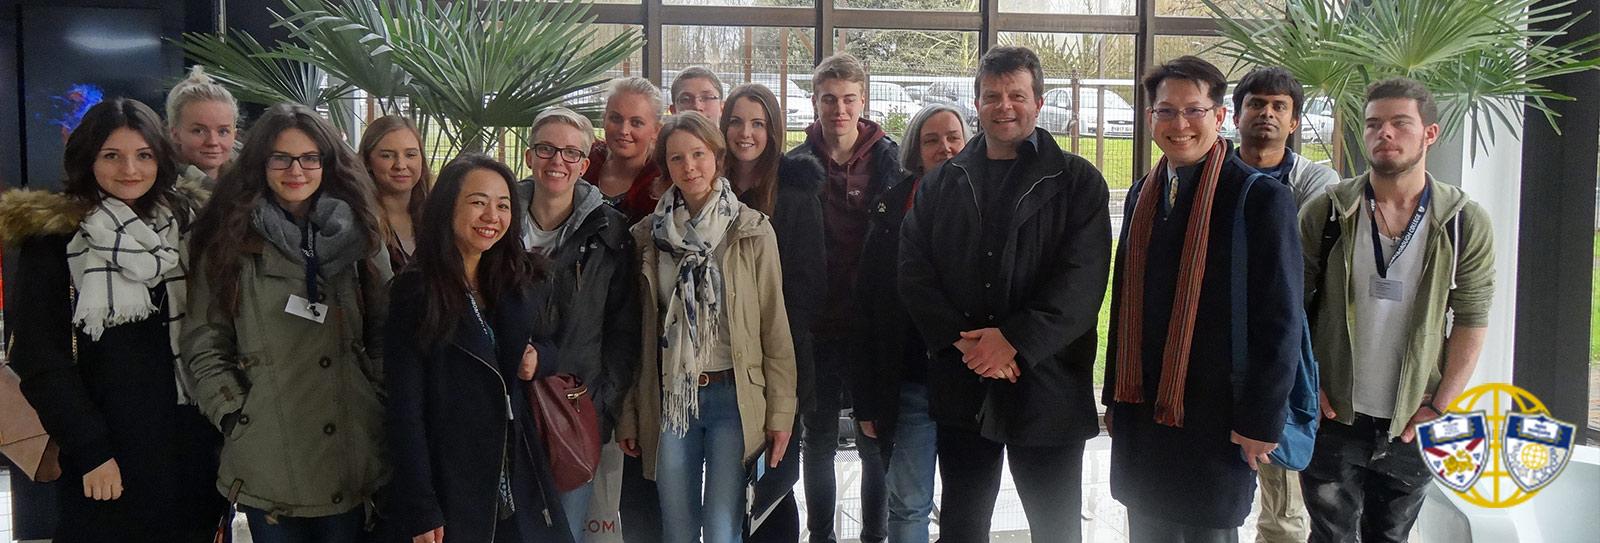 Warnborough partners with Hanse Berufskolleg to provide internships for German students